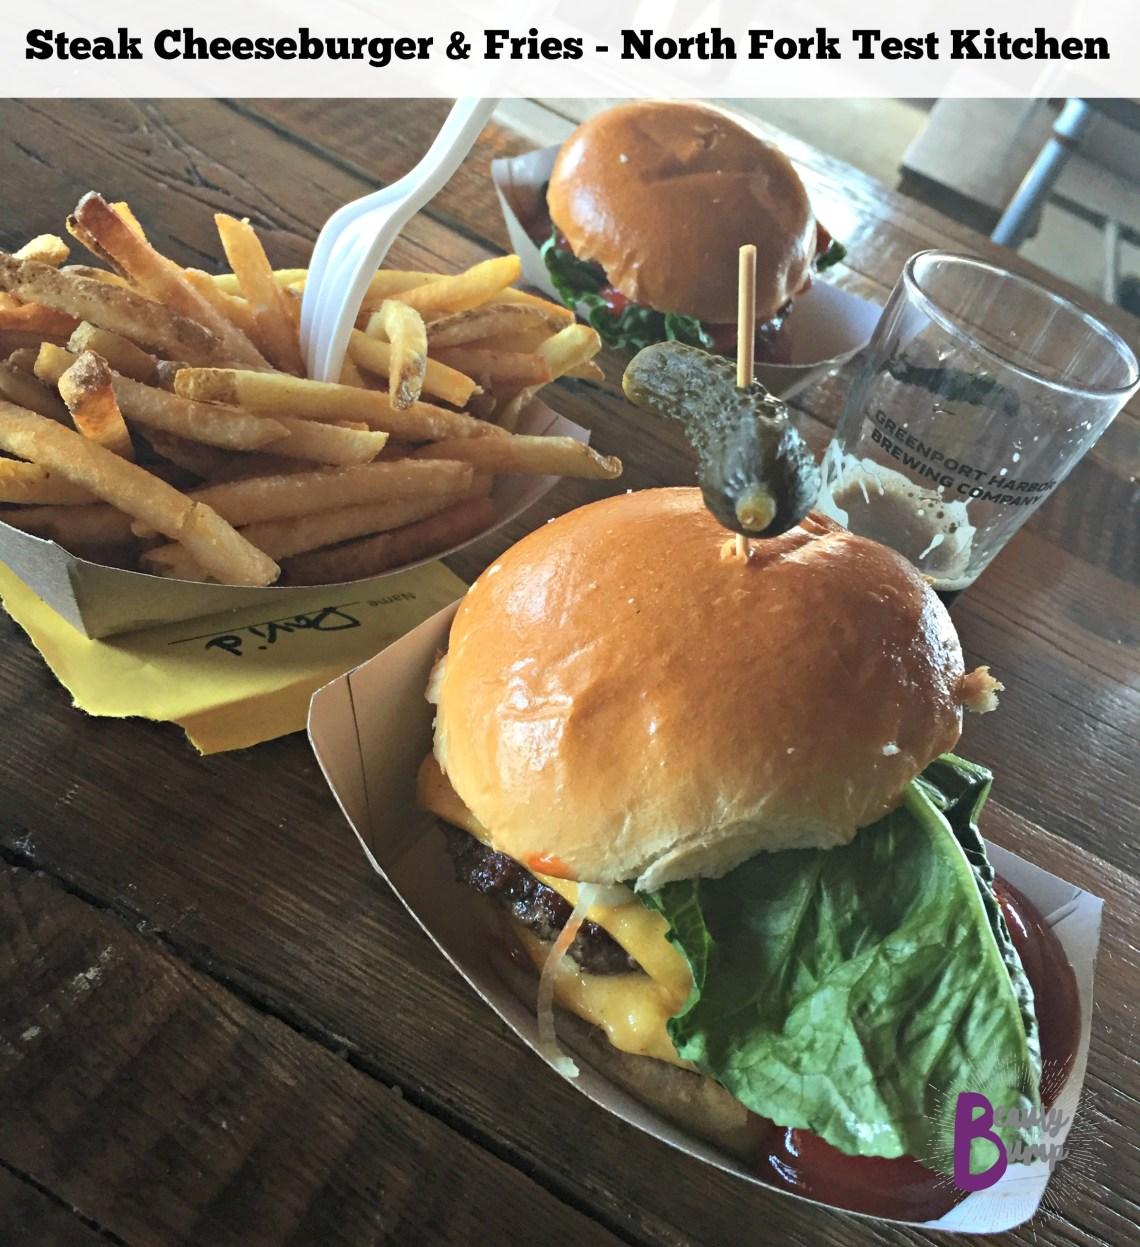 Steak Cheeseburger and Fries North Fork Test Kitchen